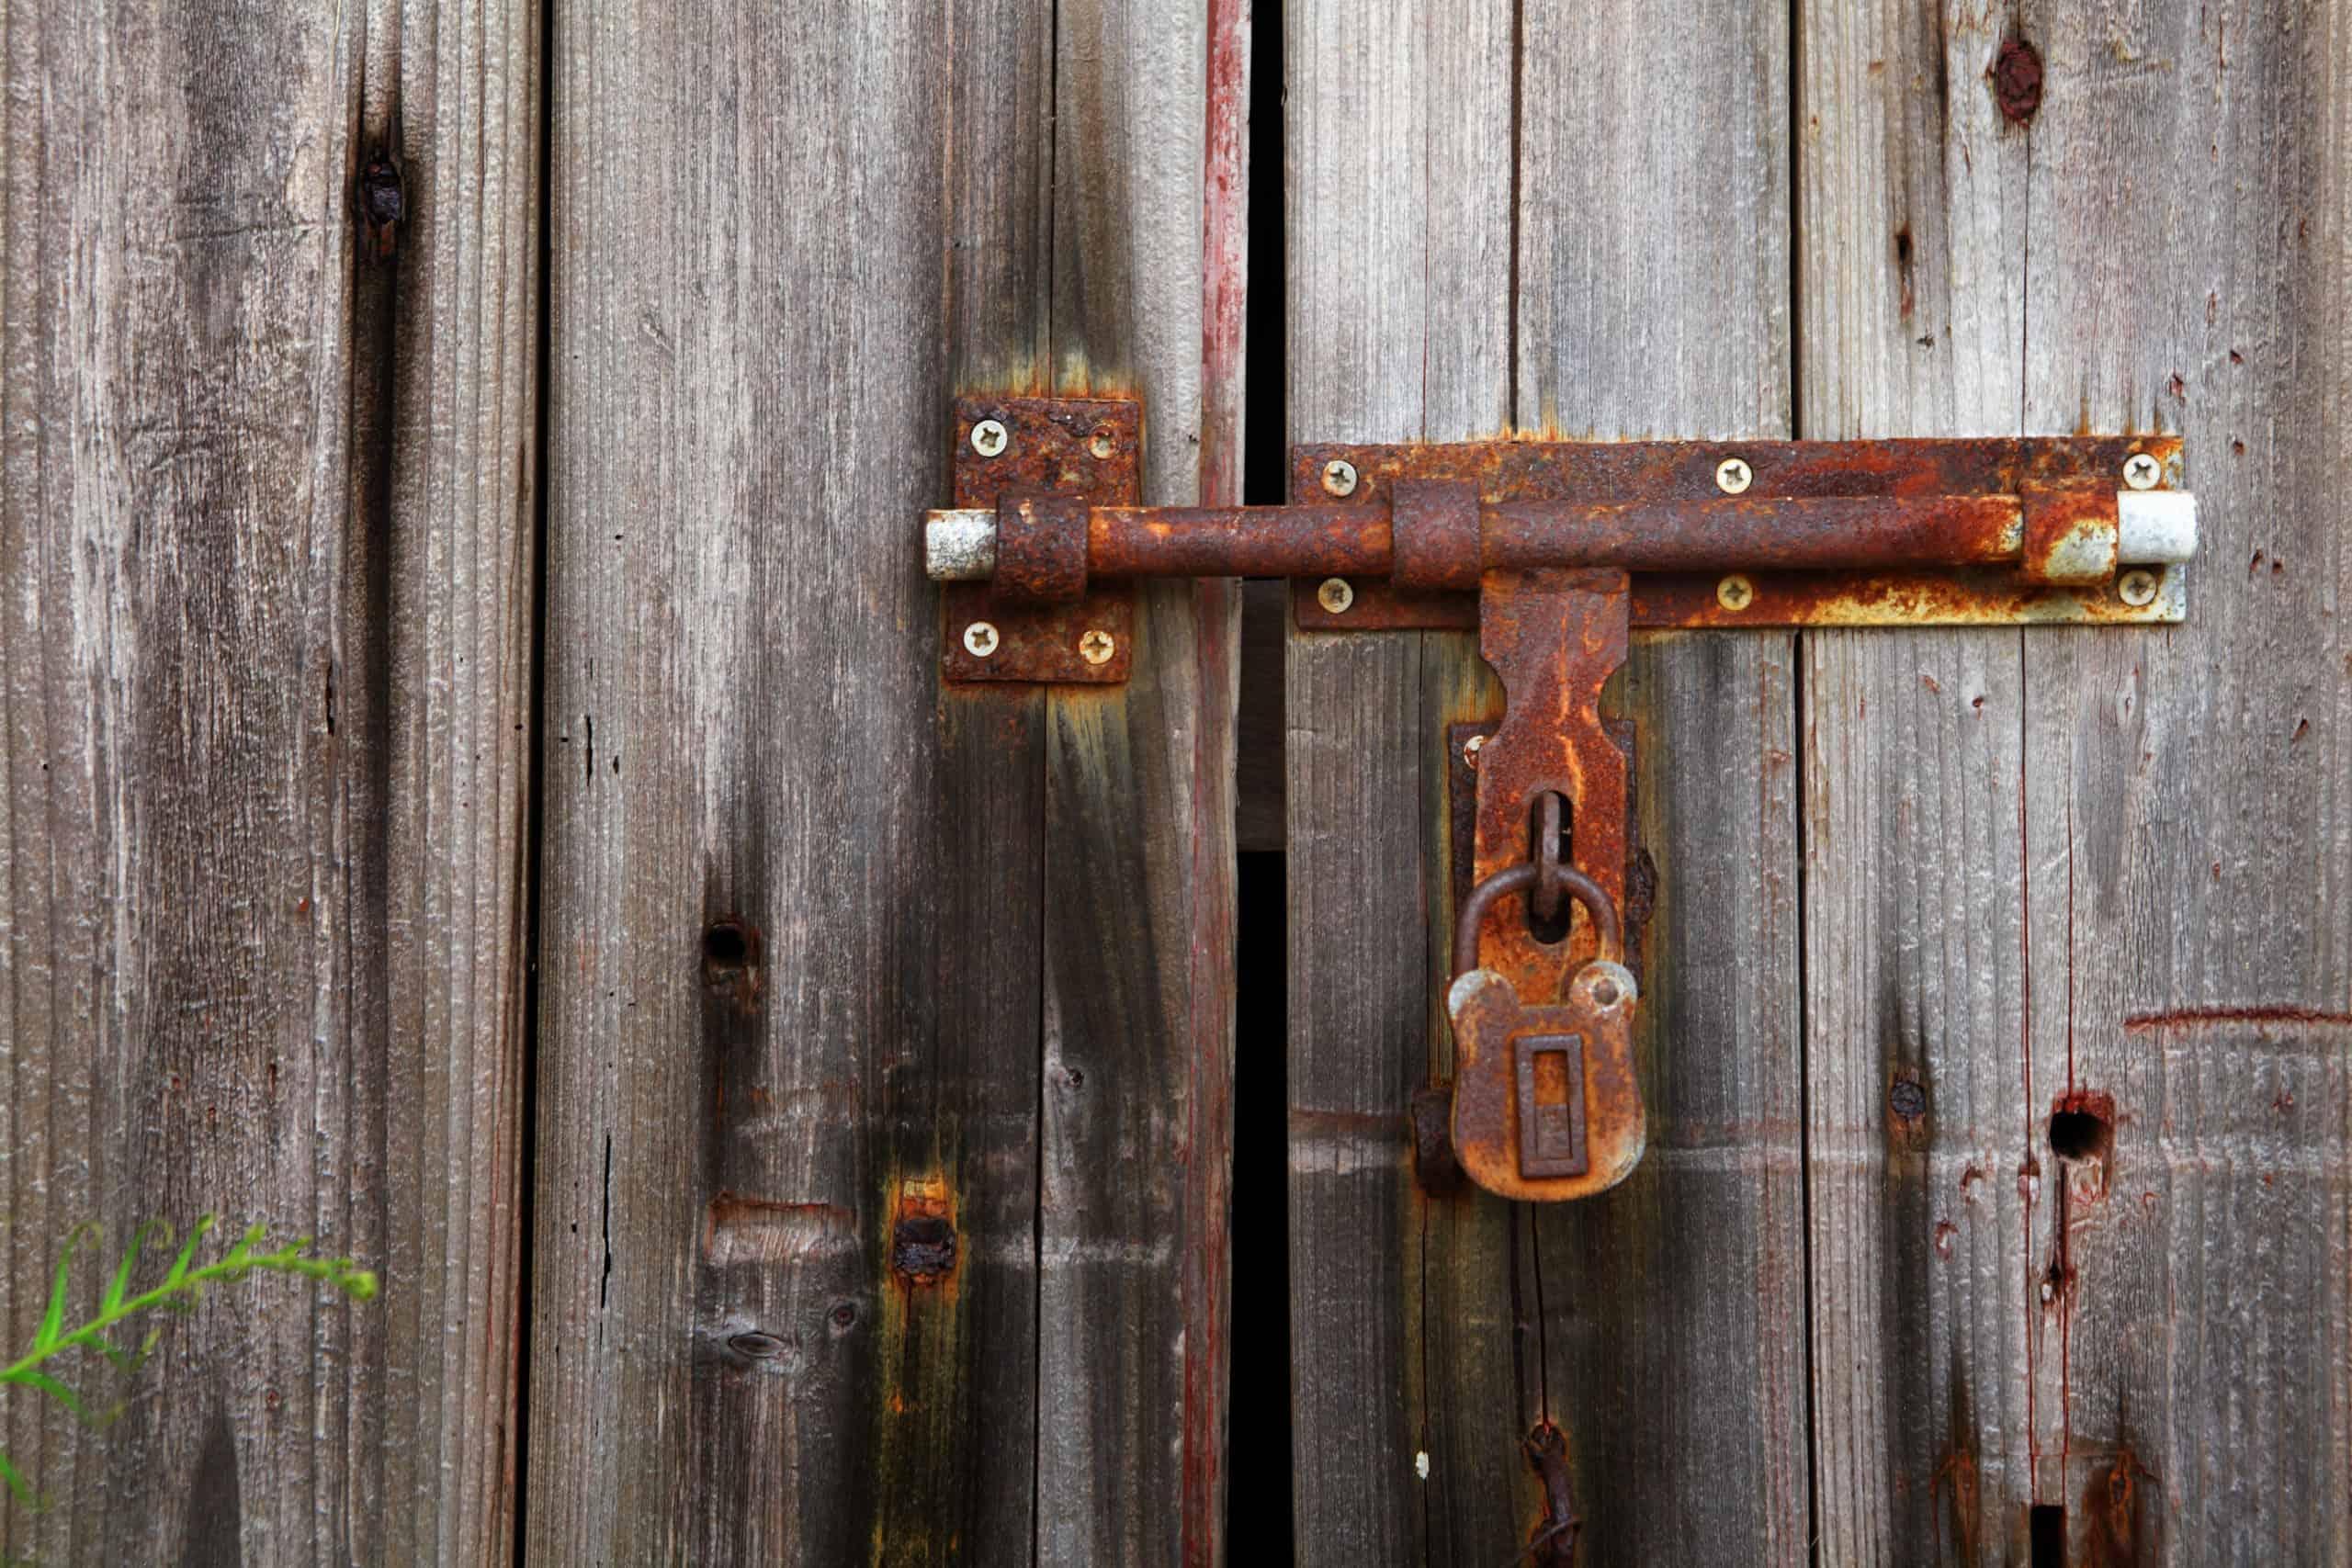 old lock on closed door 2XT3JRX scaled